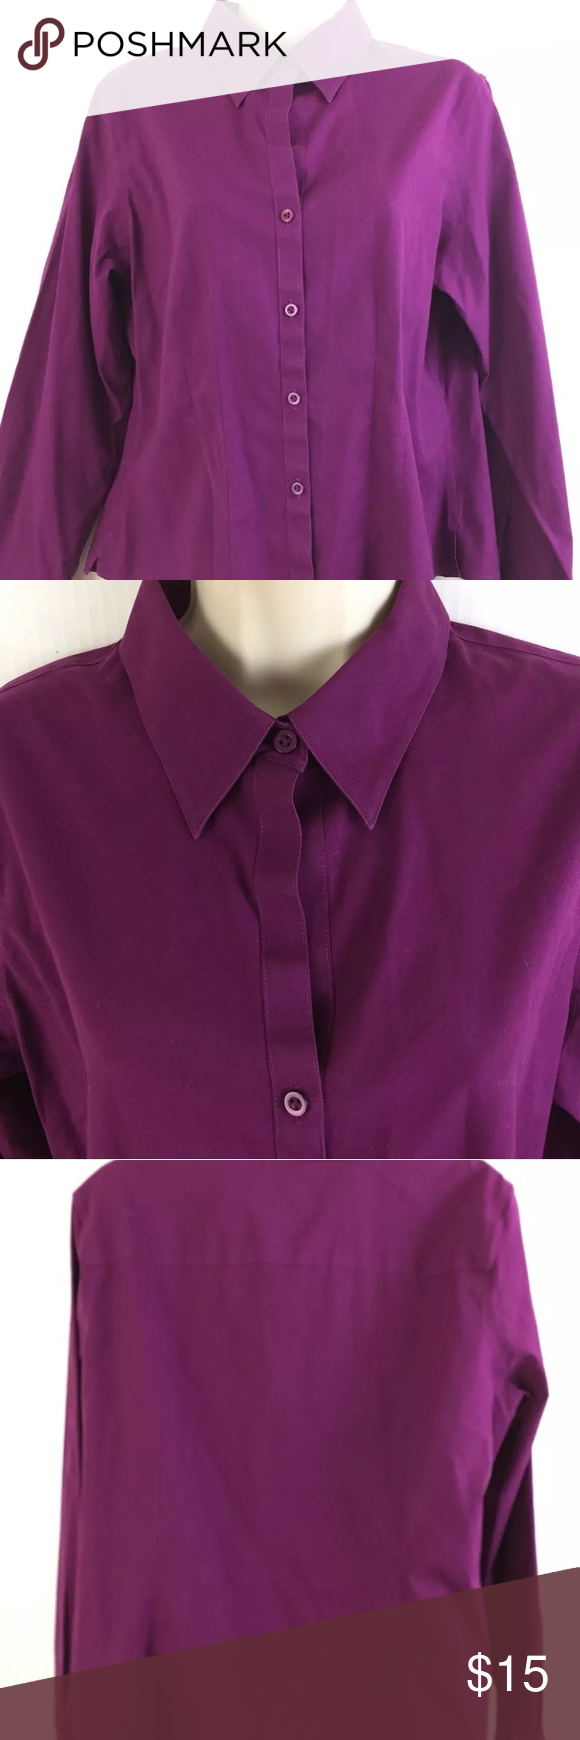 Pink dress shirt for women  Foxcroft Size  Petite Non Iron Stretch Shirt Foxcroft Womens size